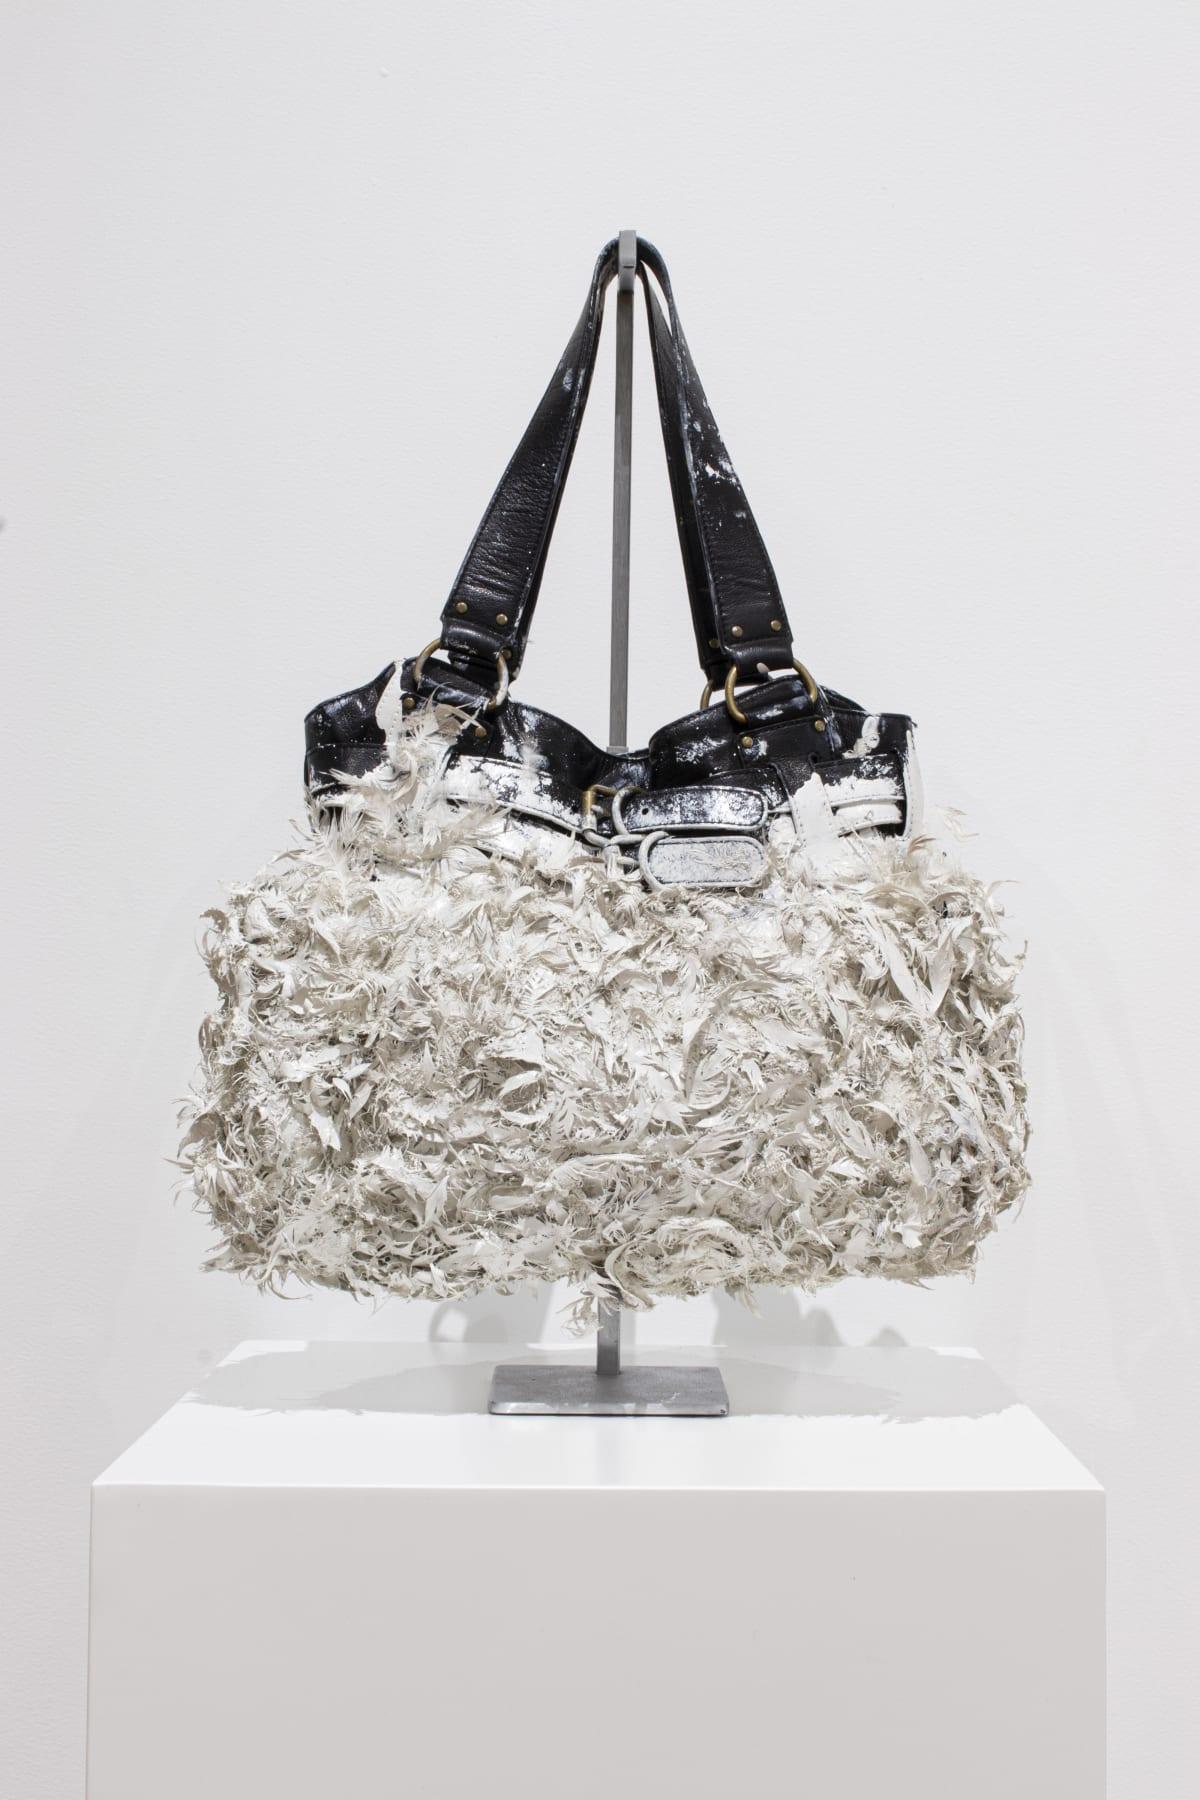 Gregory Coates, Fetish Object Series, Juju Inside (Barbara), 2019